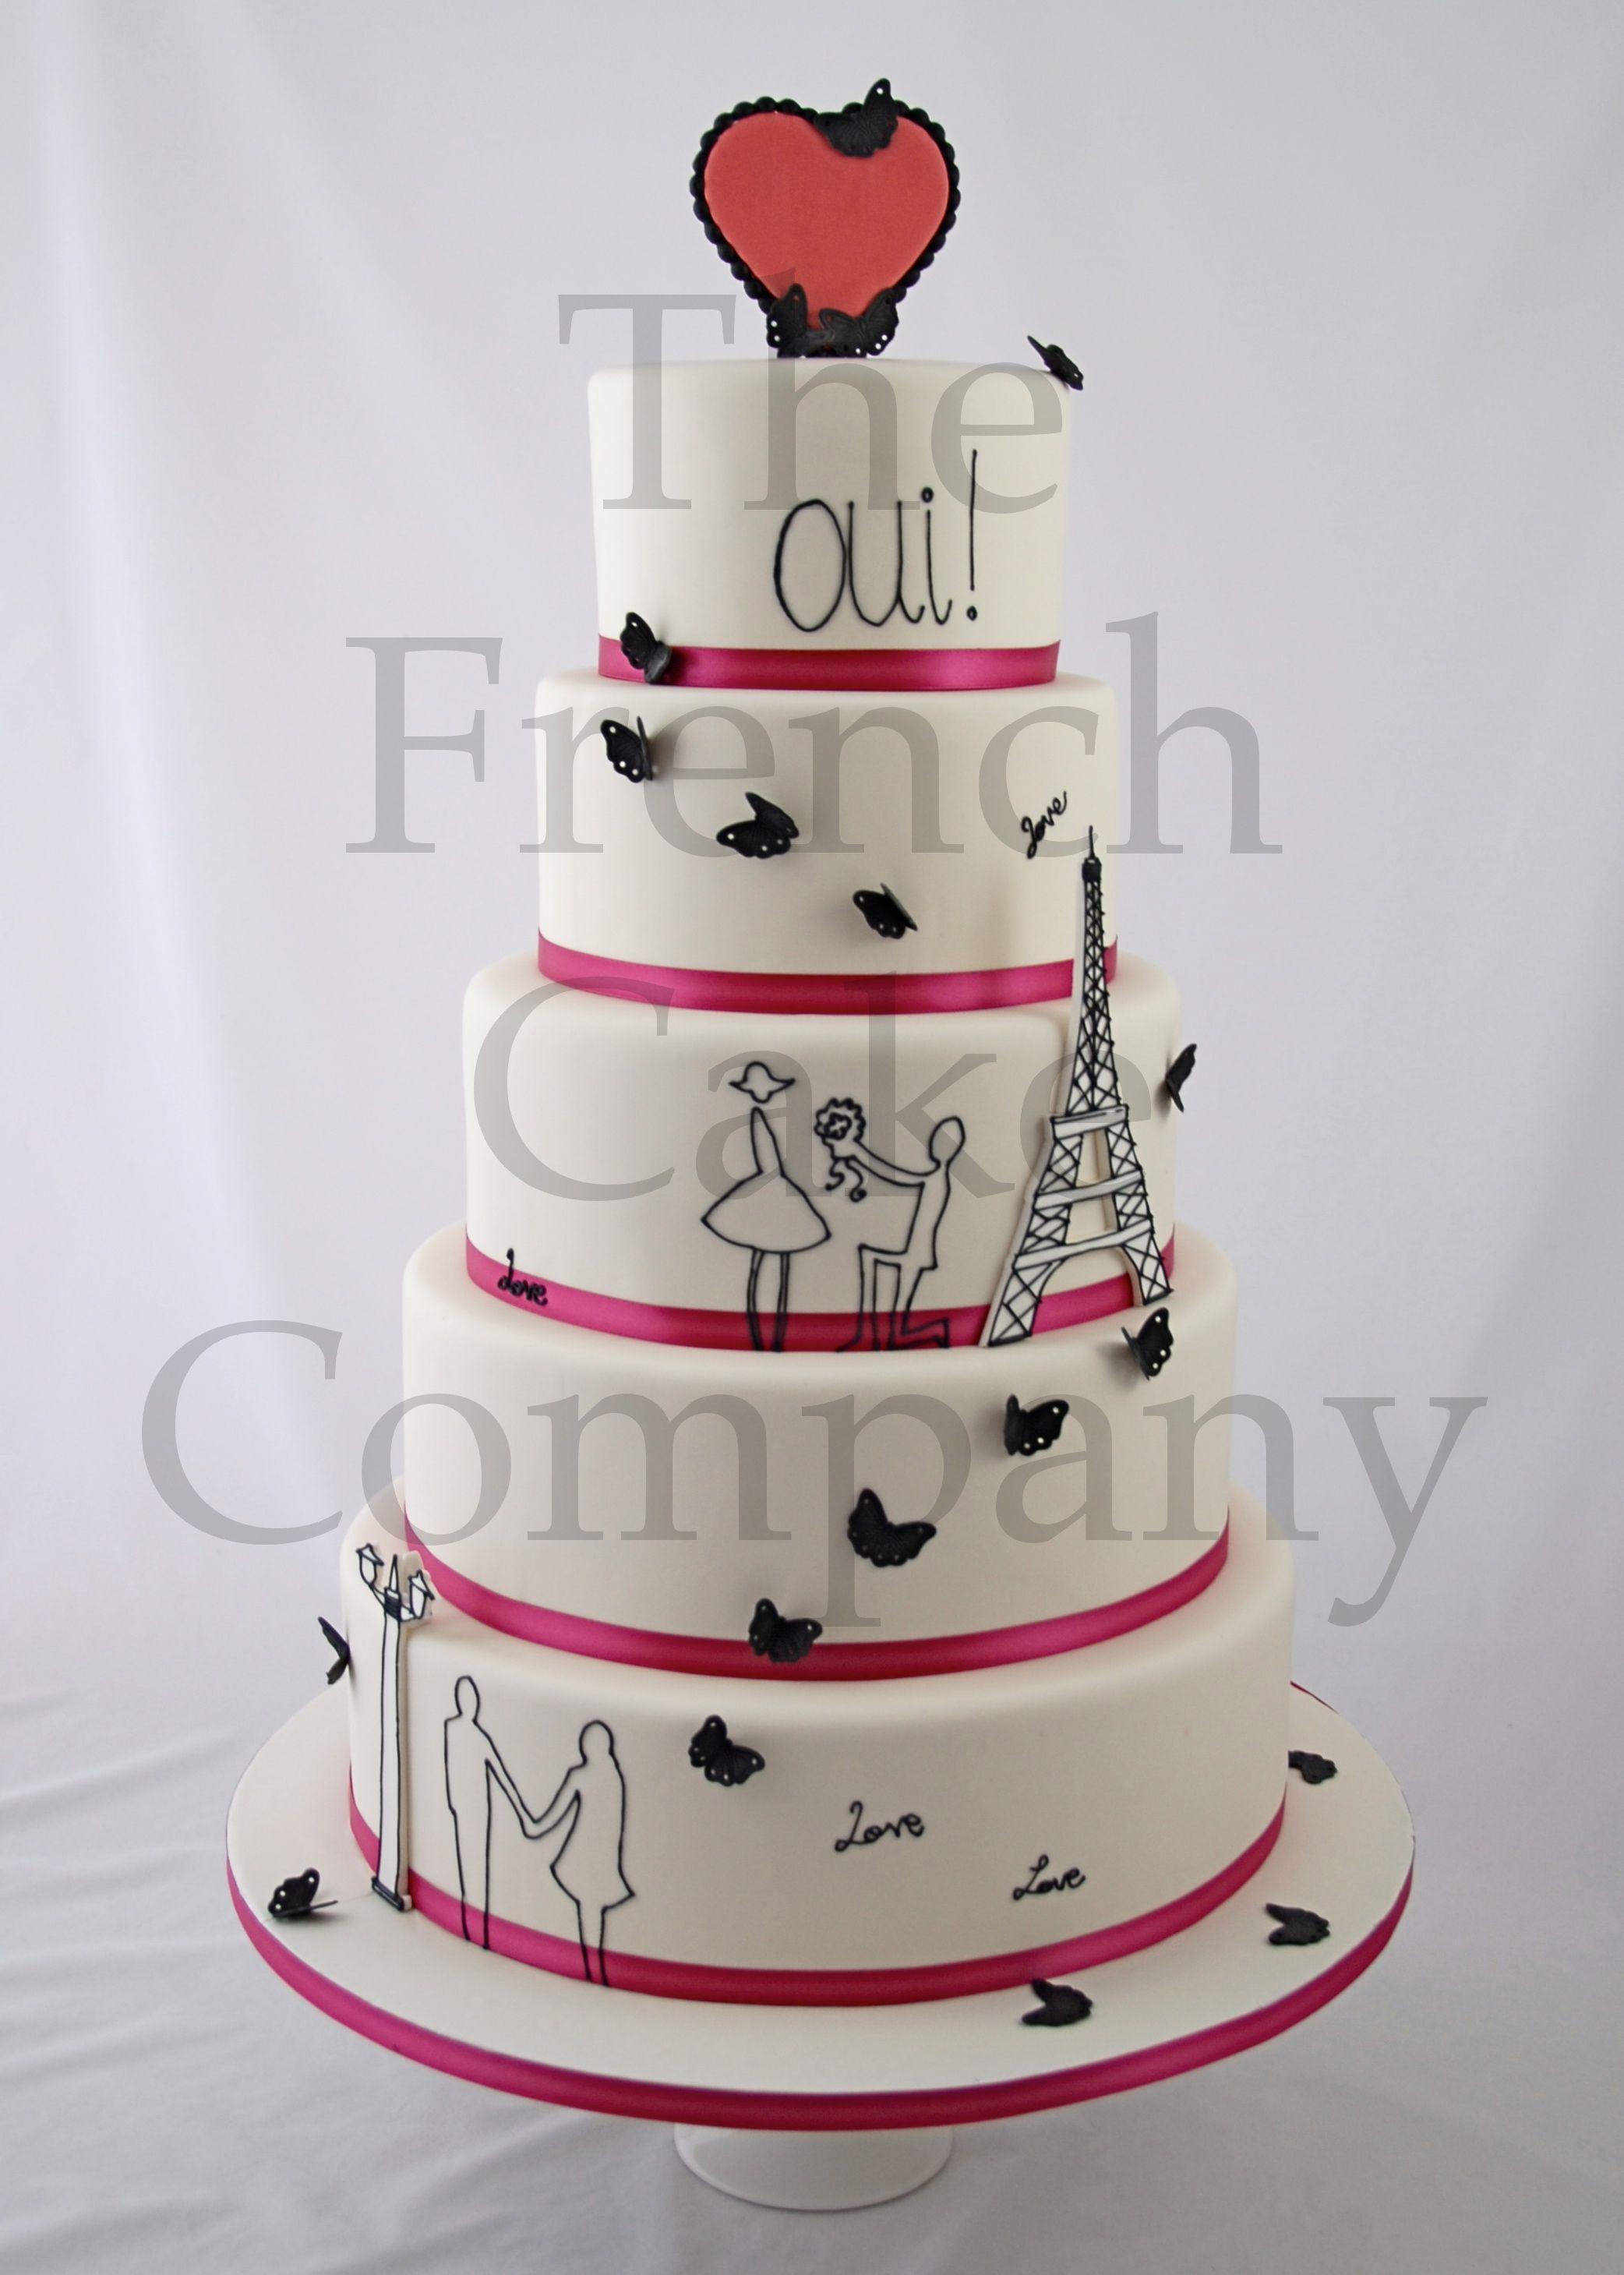 wedding cake eiffel tower piece montee mariage tour. Black Bedroom Furniture Sets. Home Design Ideas